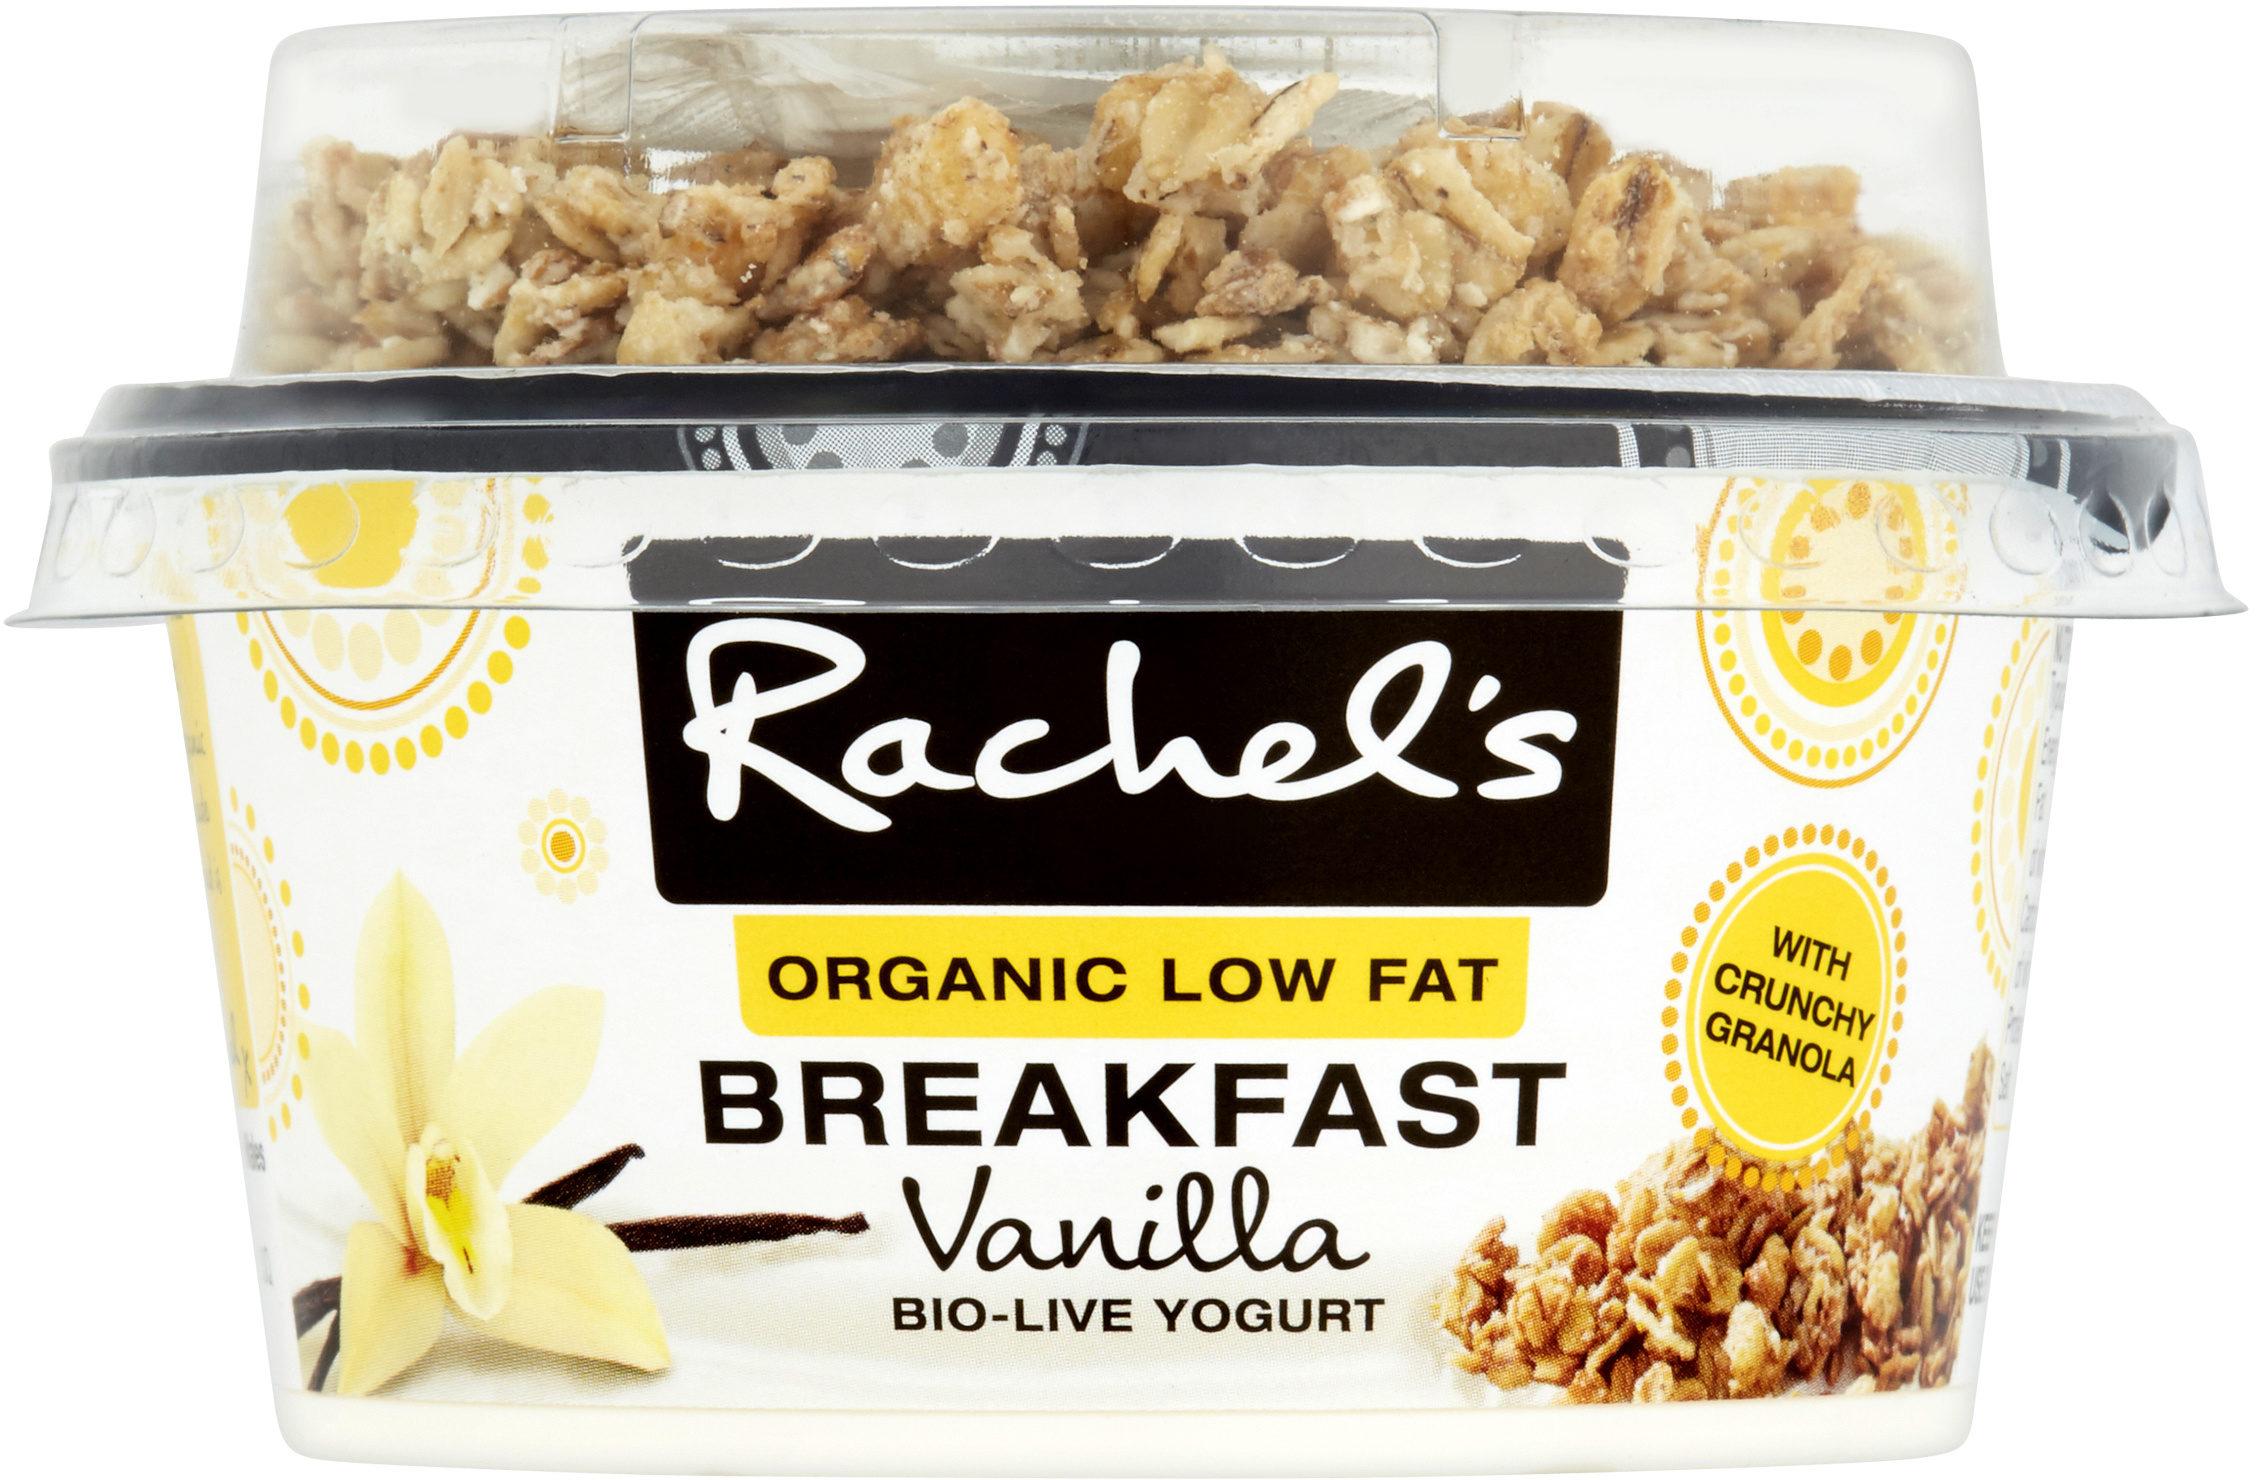 Rachel's Organic Low Fat Breakfast Vanilla Yogurt - Product